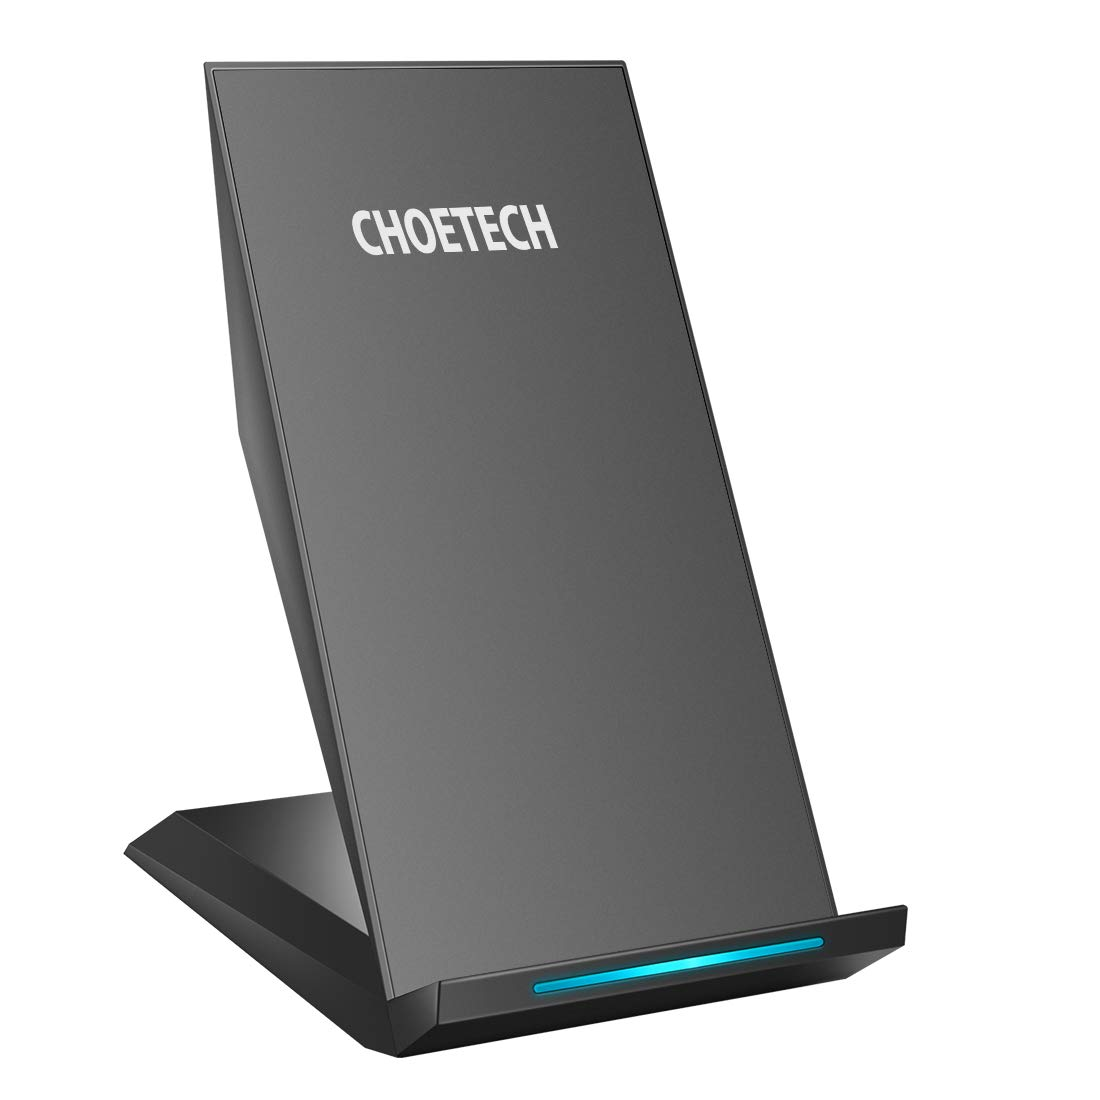 CHOETECH Cargador Inalámbrico Rápido Fast Wireless Charger Qi Cargador Rápido Soporte Compatible con iPhone XS/